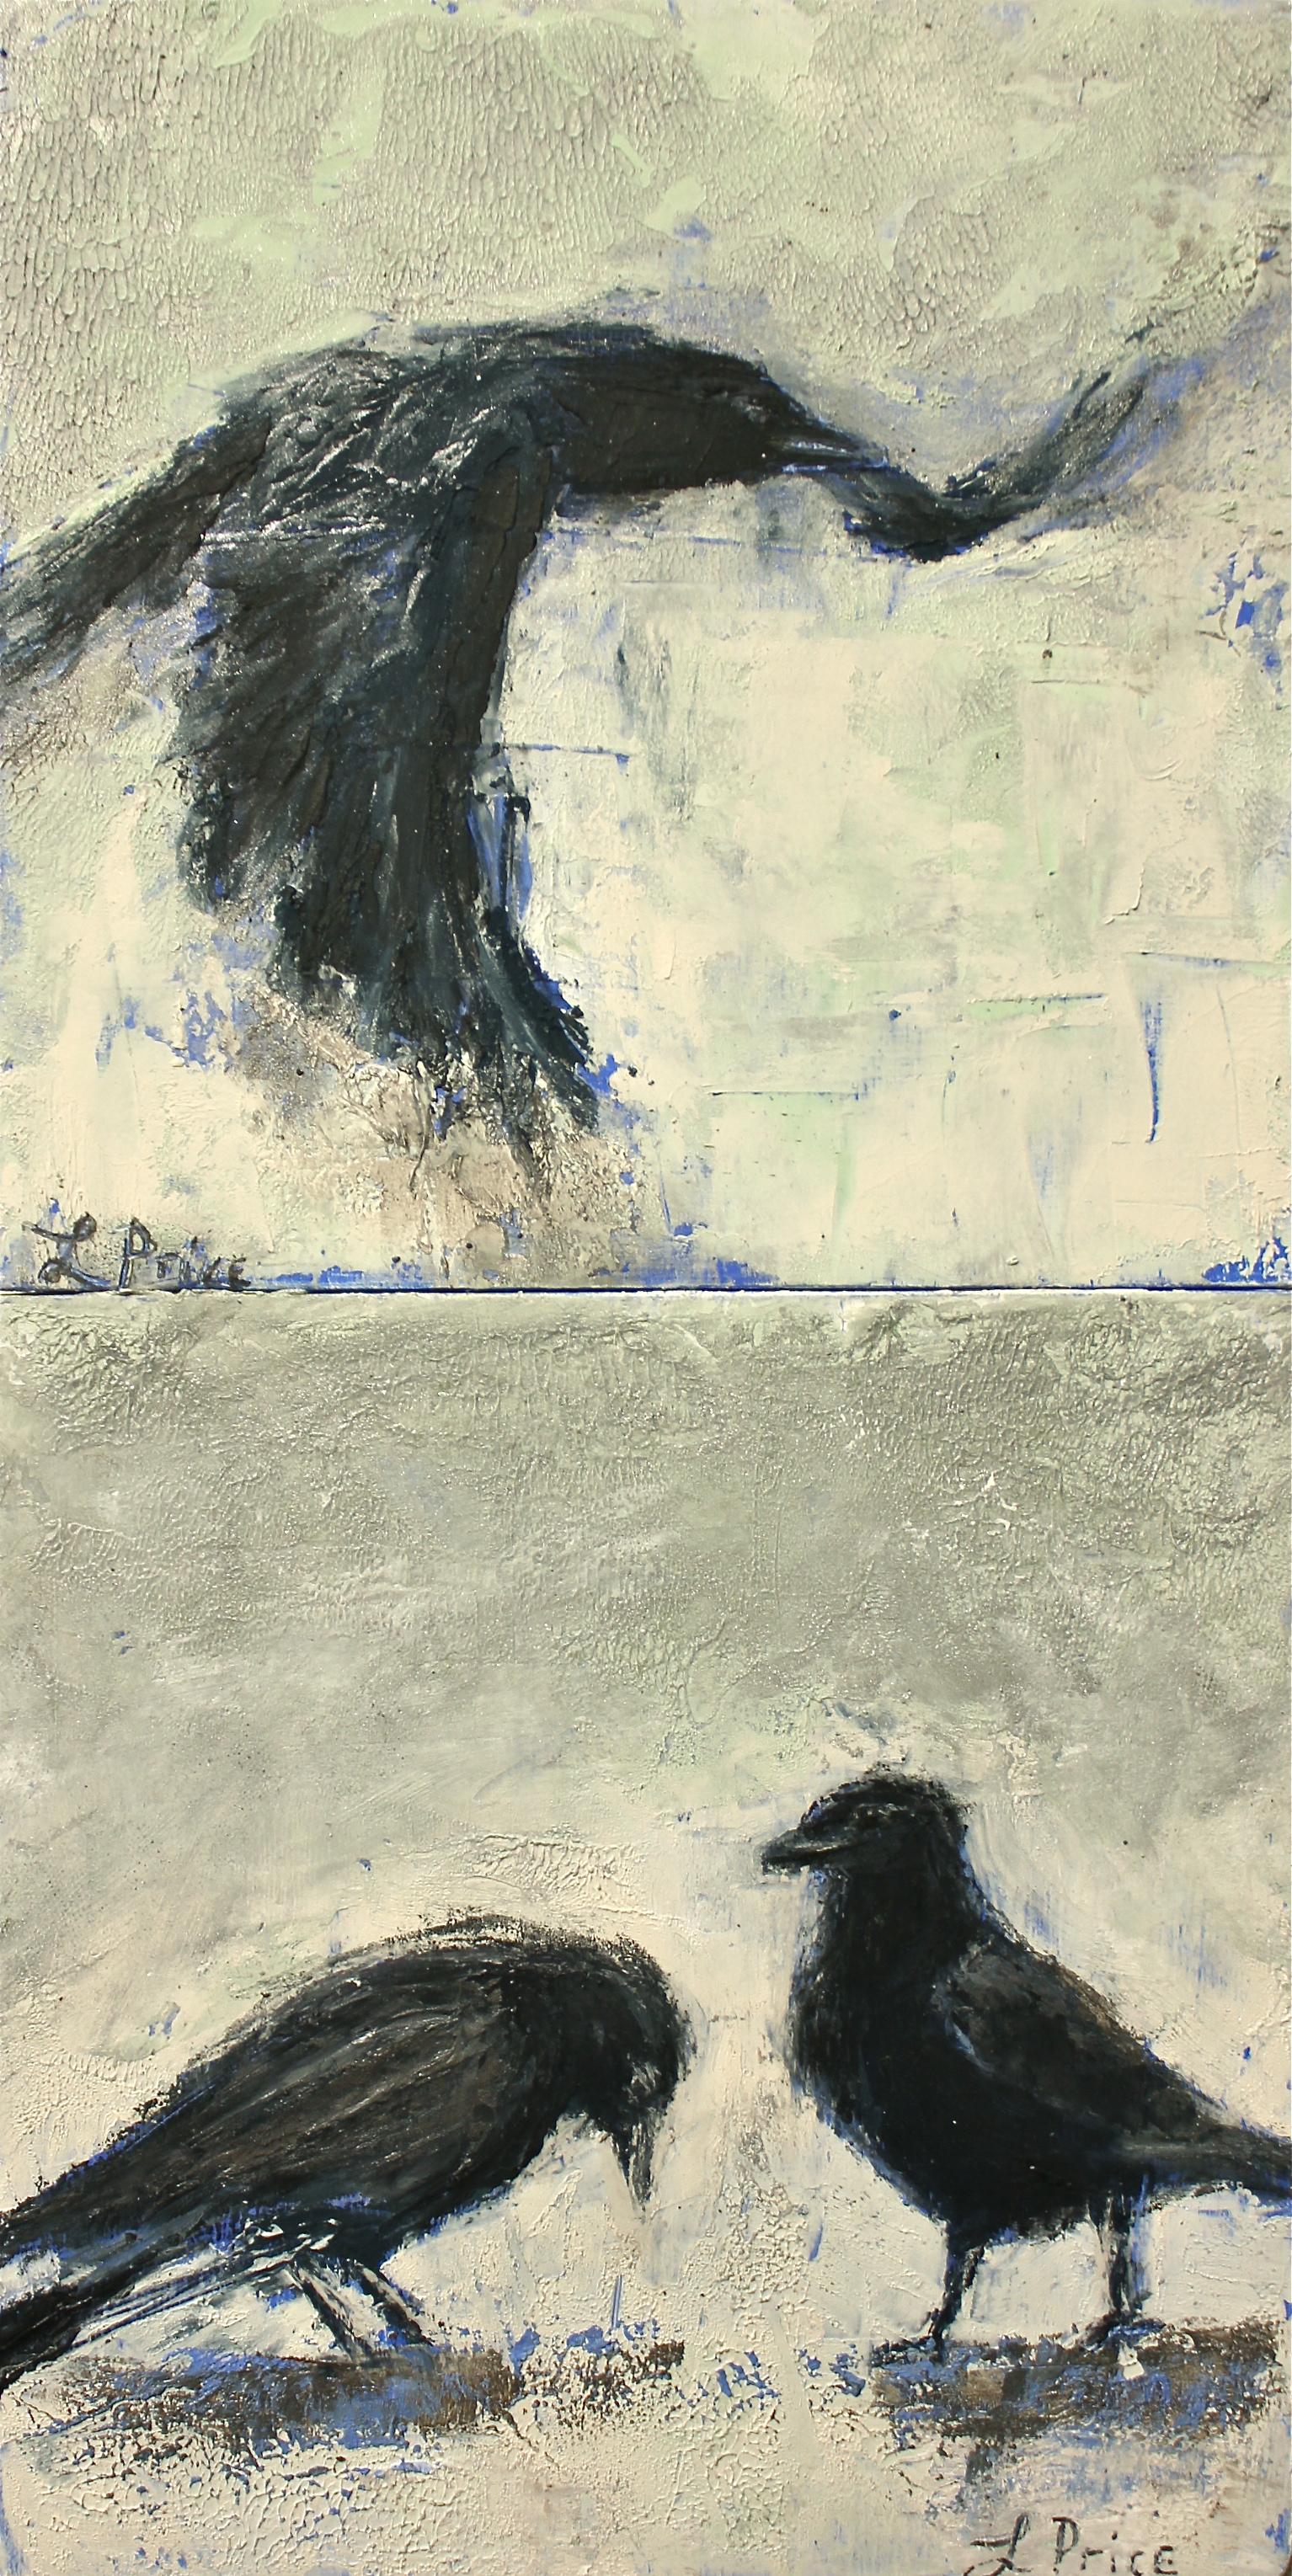 Winter Crow 2 & 3